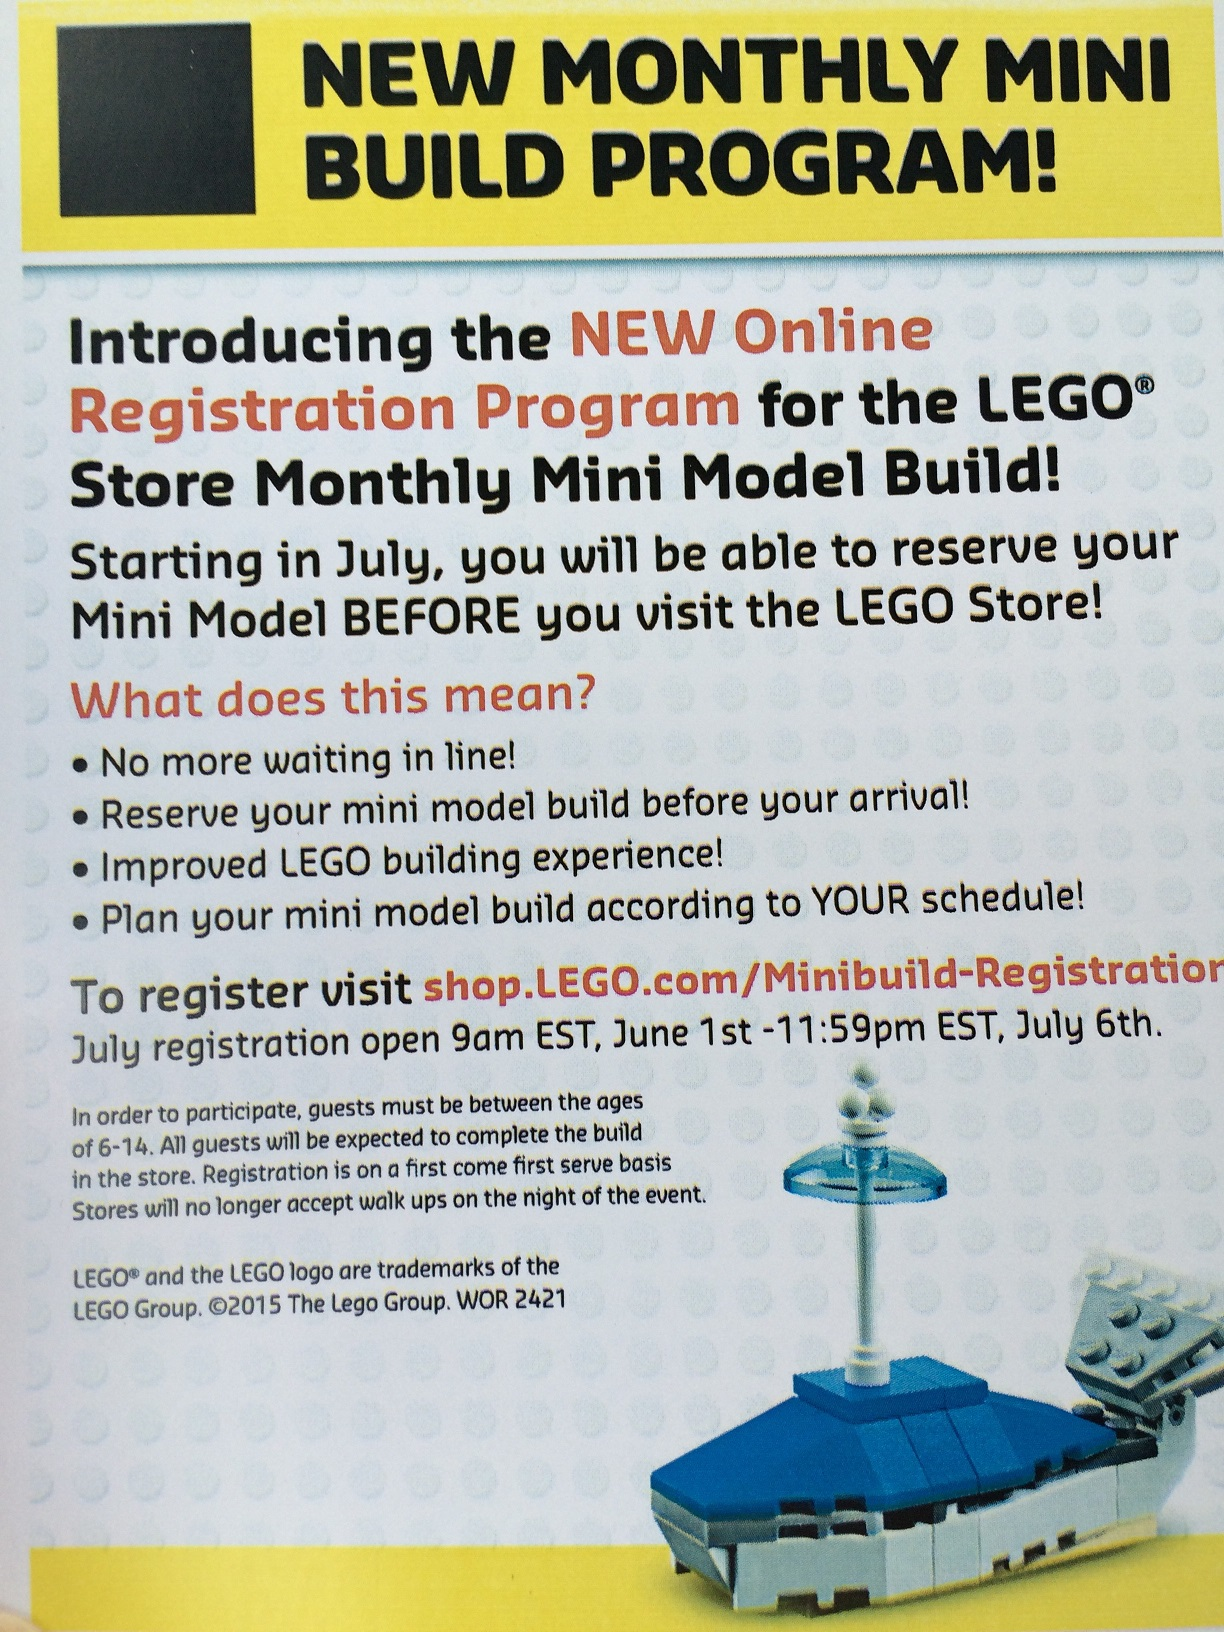 toys n bricks lego news site s deals reviews mocs blog monthly mini model build lego store changes 2015 toysnbricks